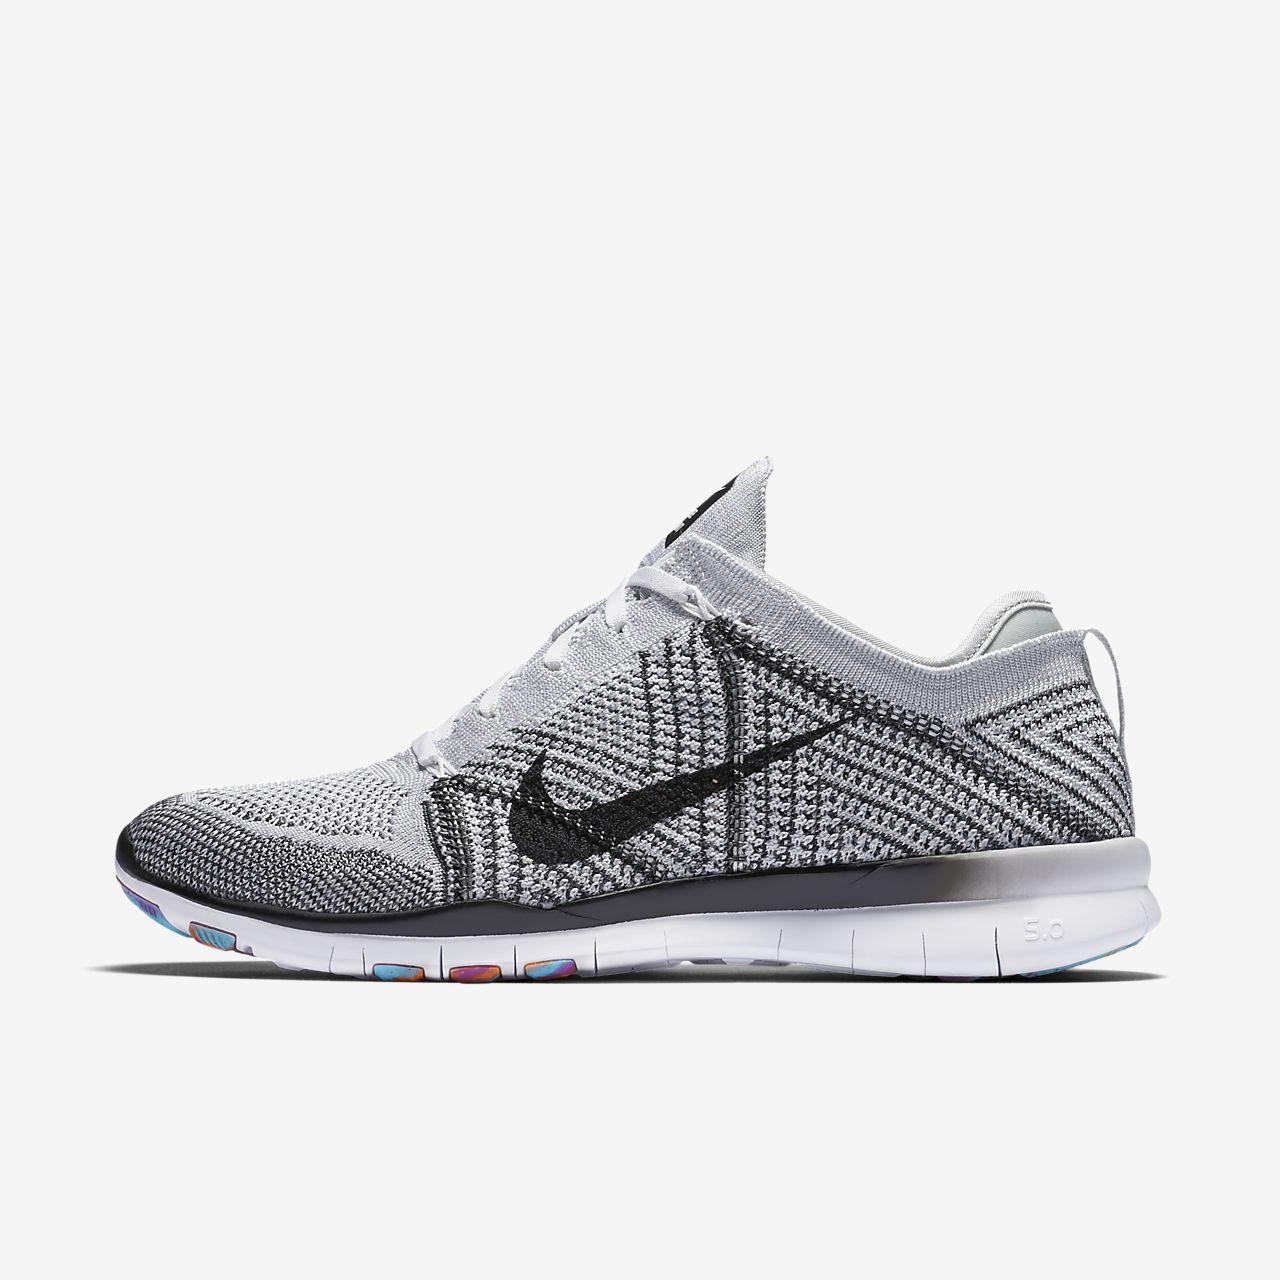 ... Chaussure de training Nike Free TR 5 Flyknit pour Femme